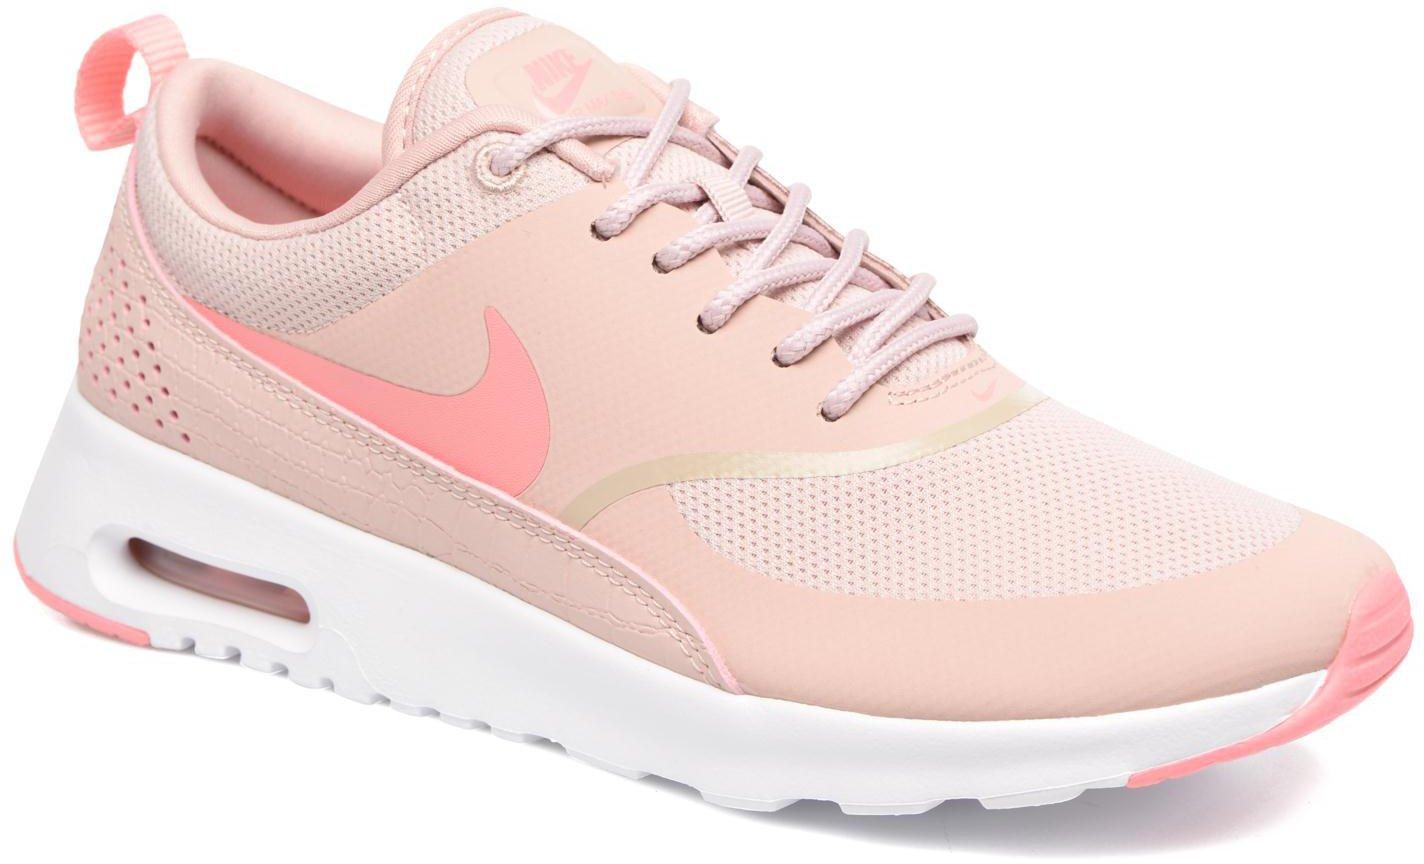 new styles c3683 c9a82 Nike Air Max Thea pink oxford bright melon white günstig kaufen ✓